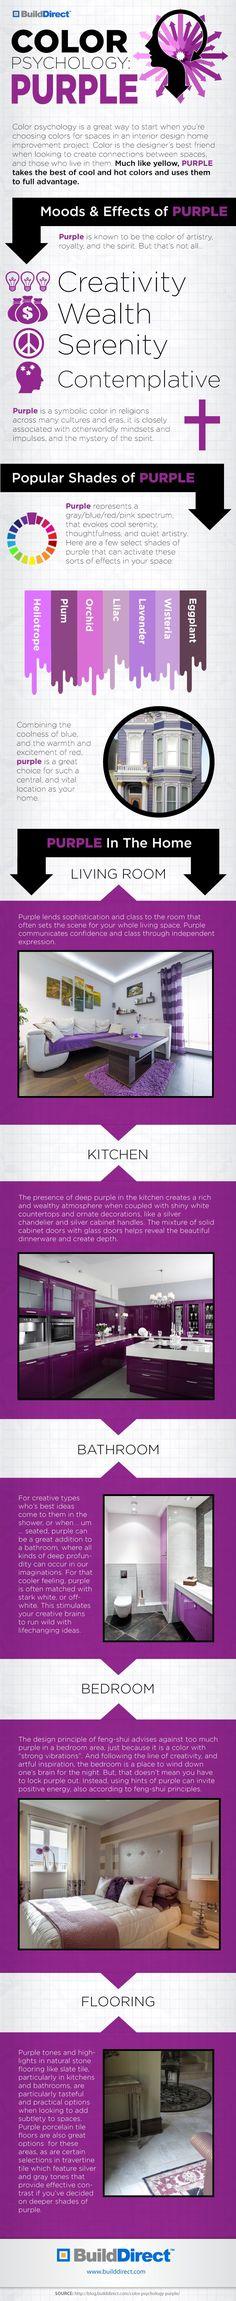 Color Psychology Purple copy Emotional Interior Design: Using Purple